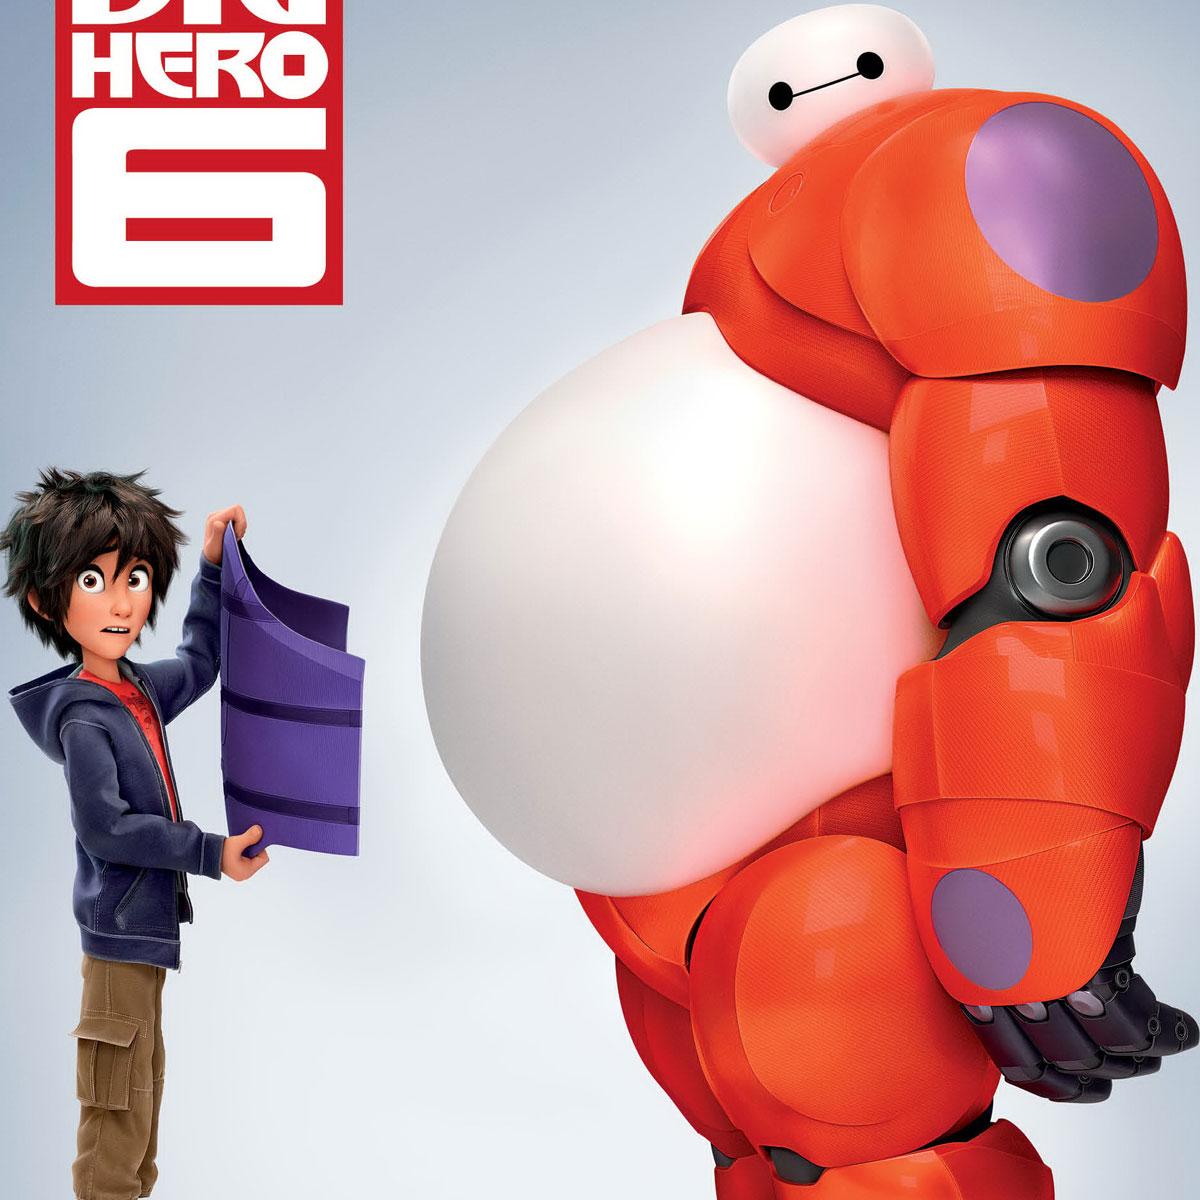 Big Hero 6 Featured Image